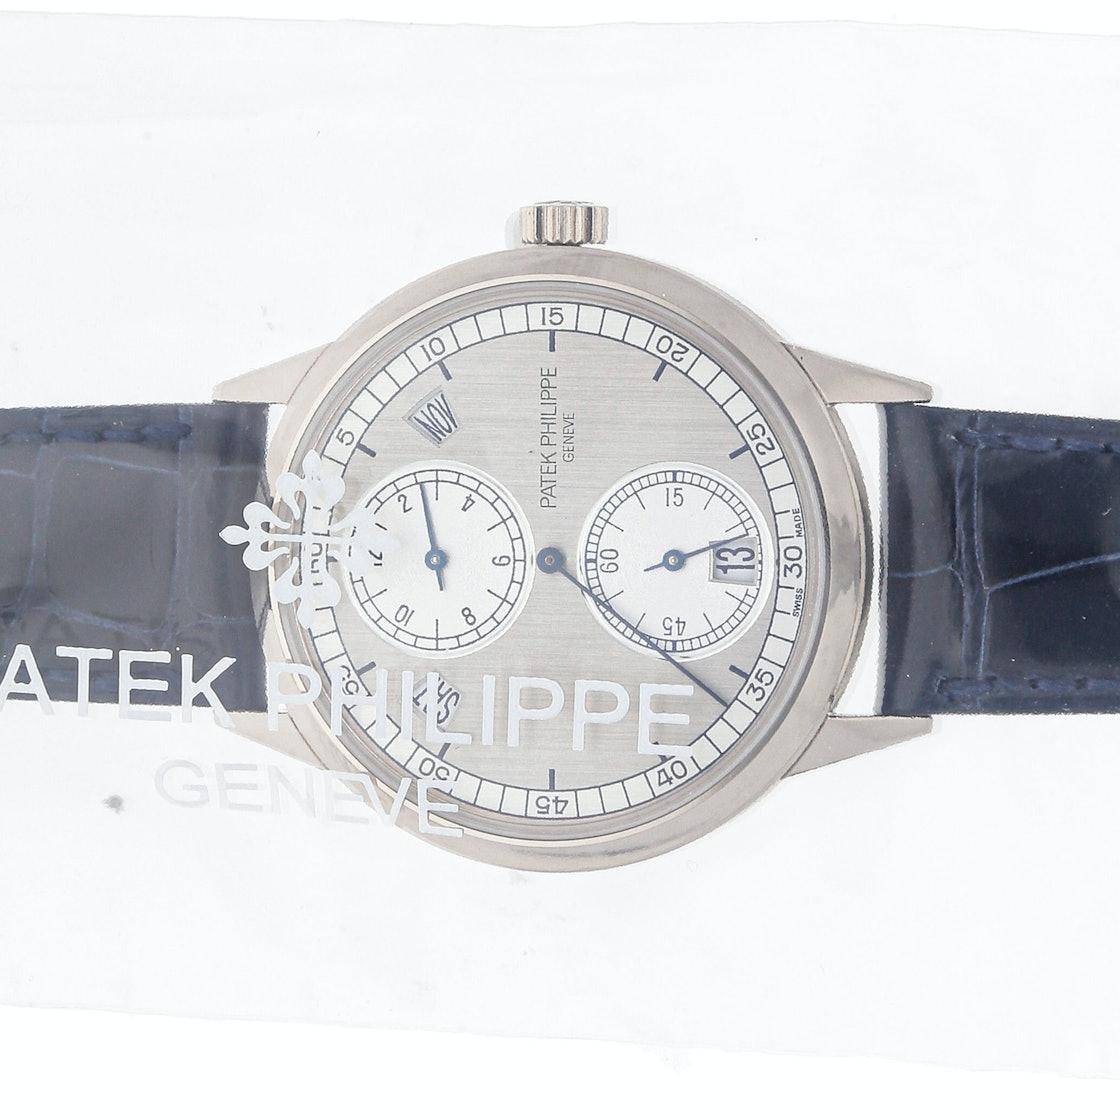 Patek Philippe Complications Annual Calendar Regulator 5235G-001